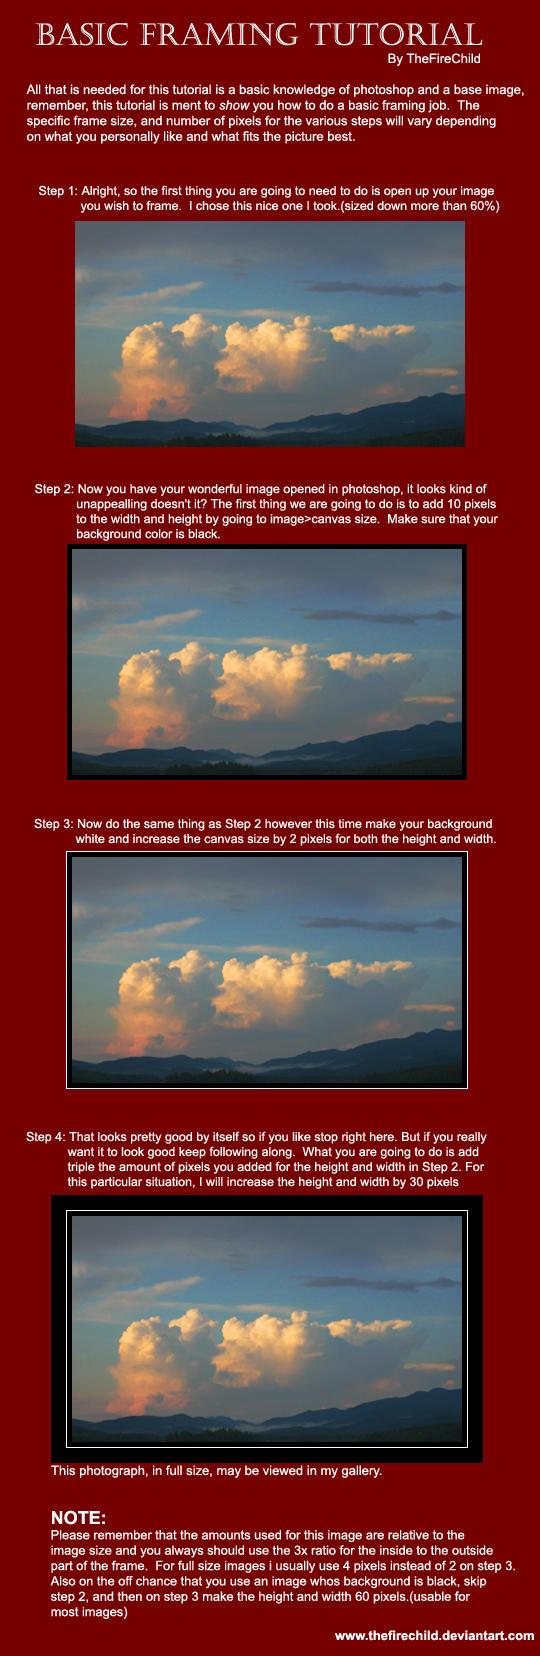 Basic Framing In Photoshop by thefirechild